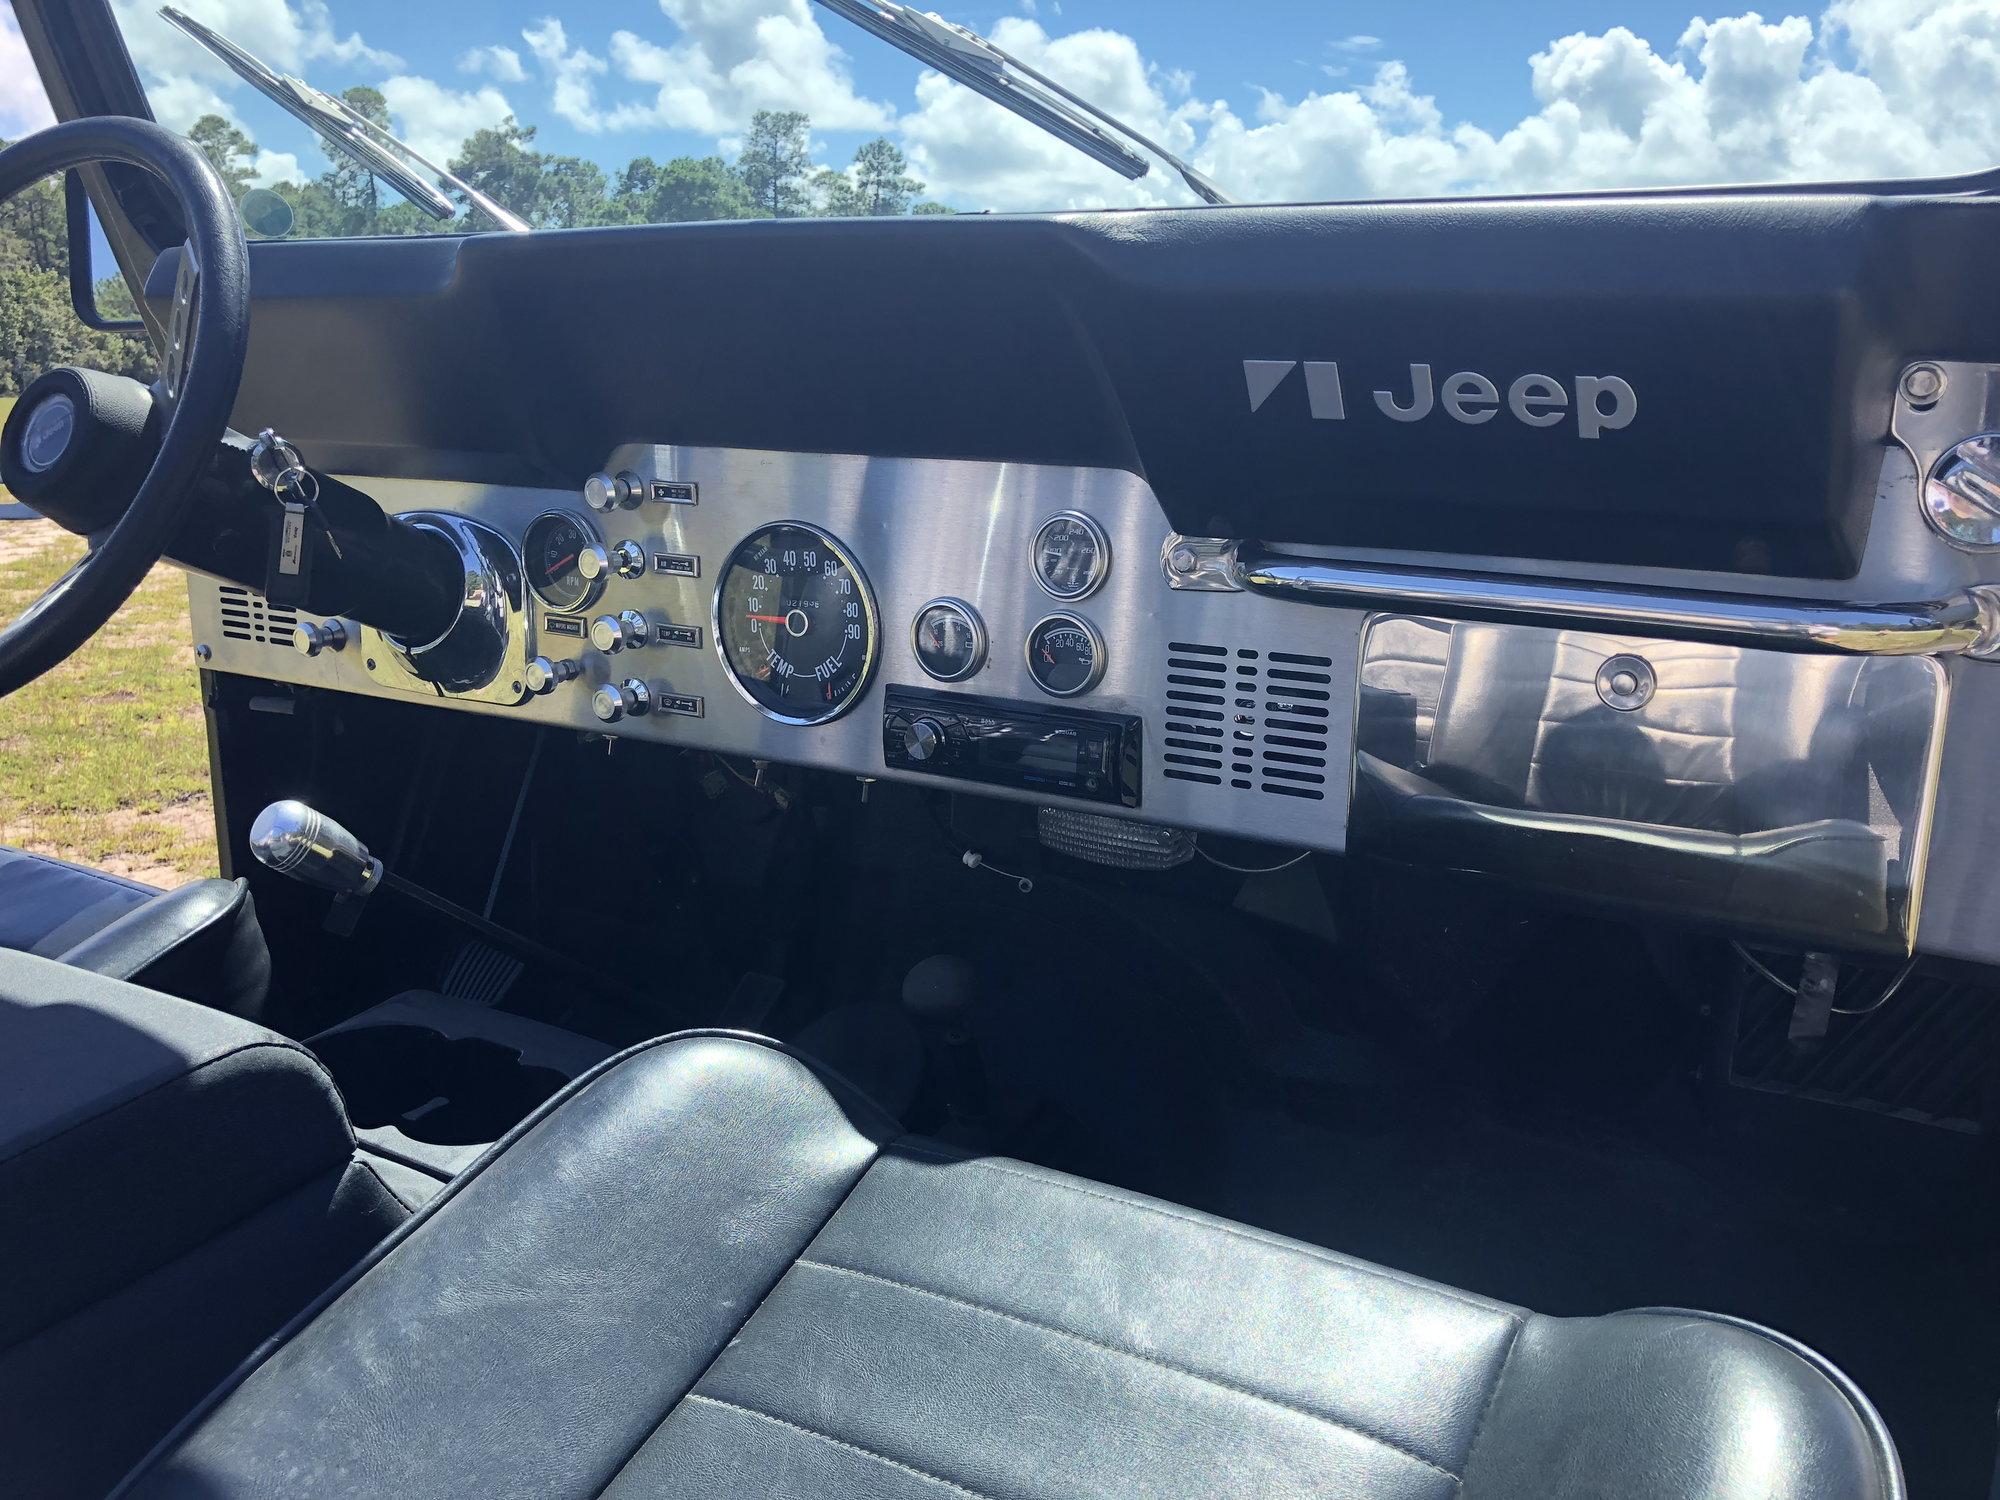 1978 Jeep CJ7 Renegade V8 For Sale ***Price Lowered ...